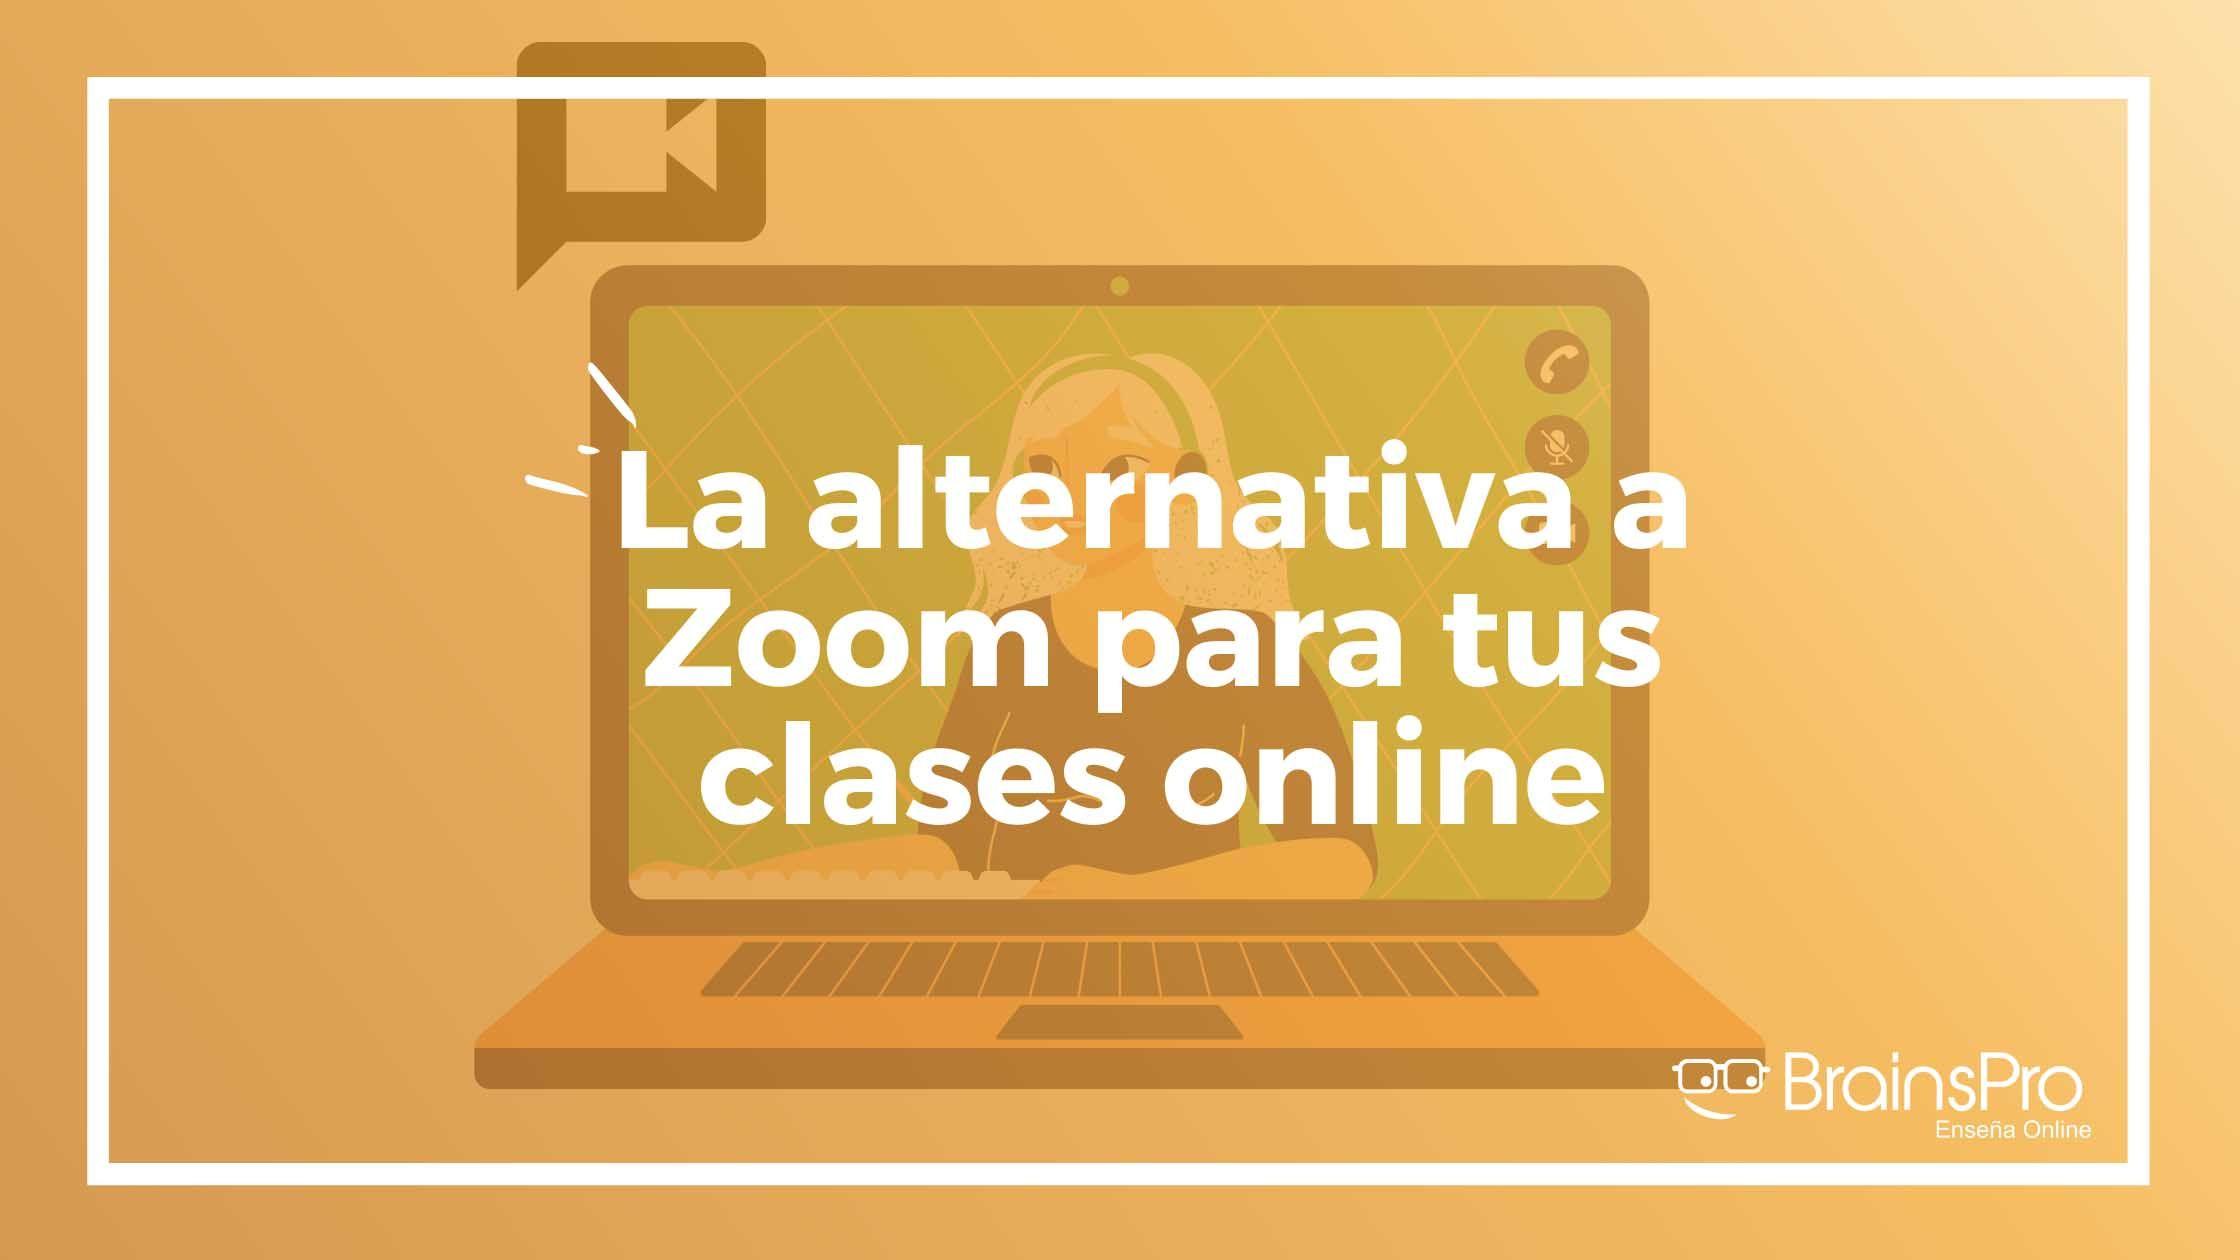 La alternativa a Zoom para el e-learning